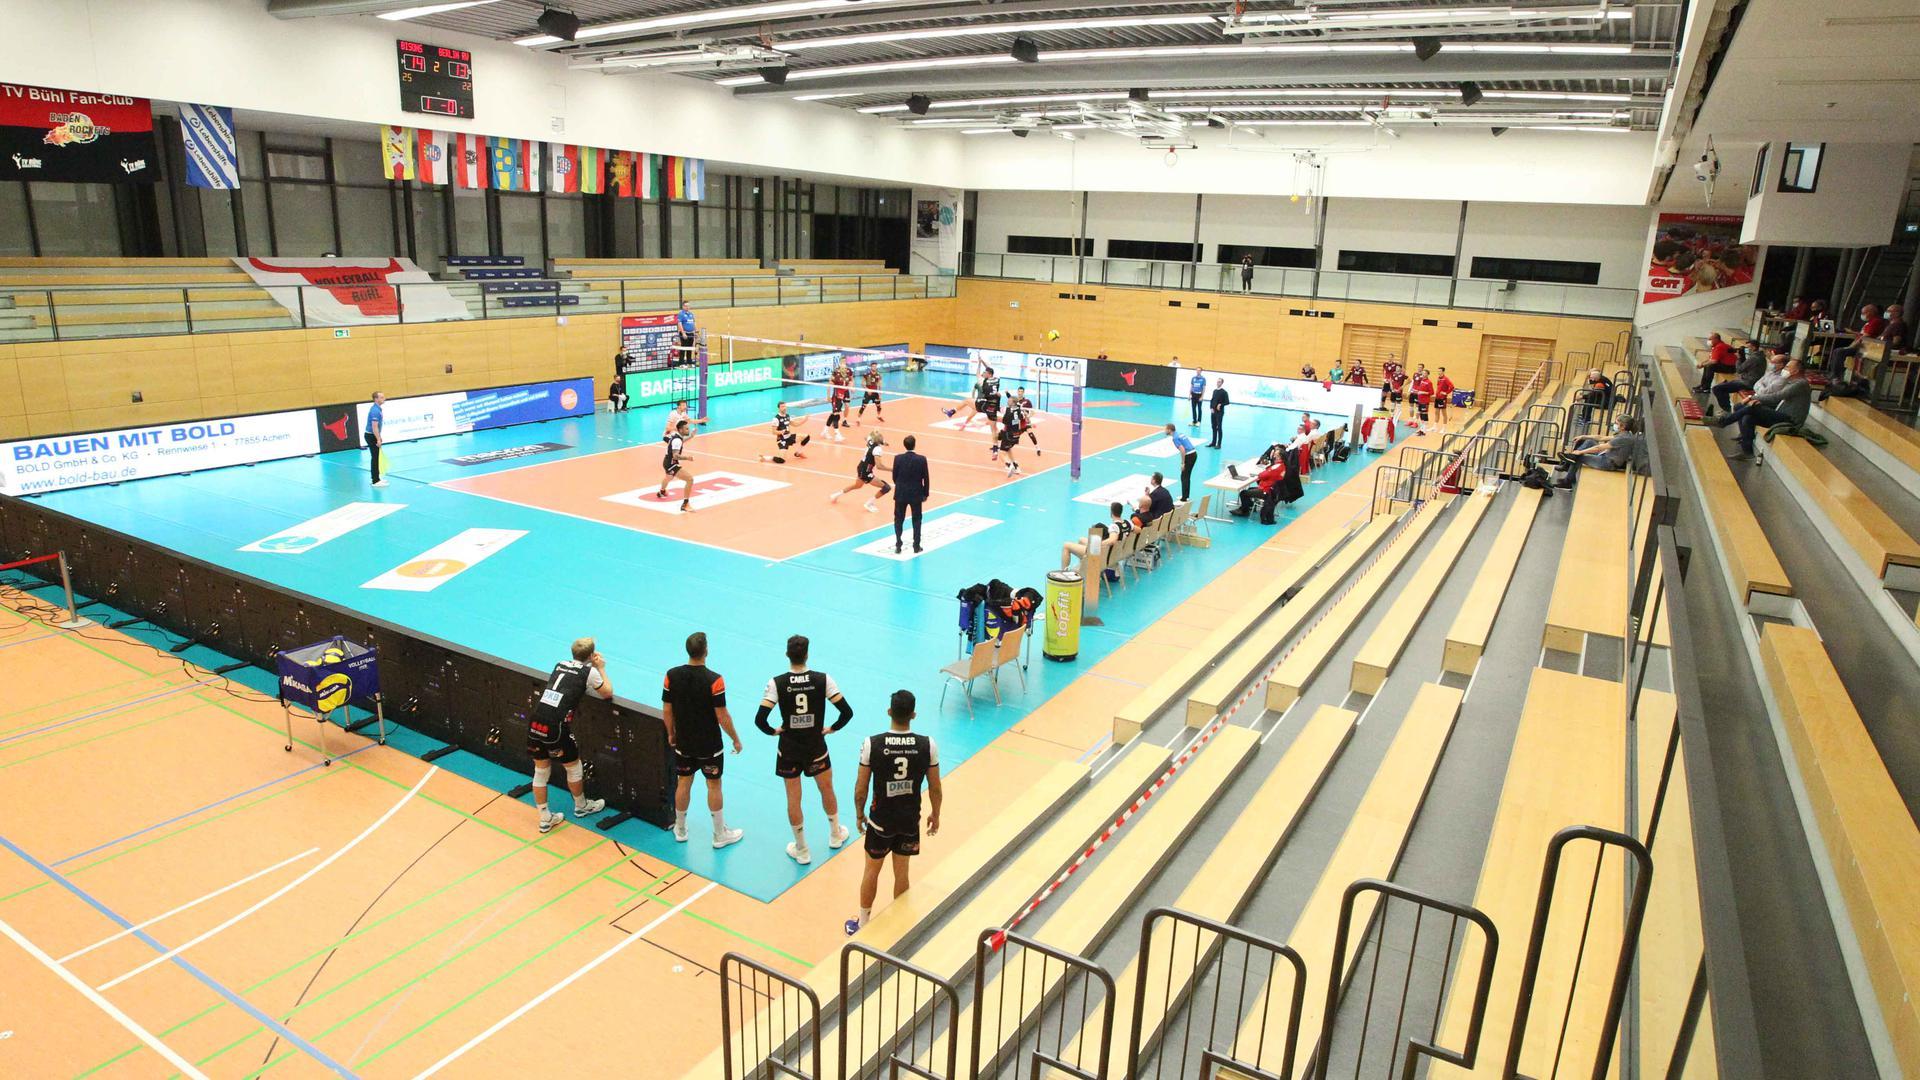 Volleyball-Bundesliga Bisons Bühl - Berlin Volleys (3:1), 31. Oktober 2020